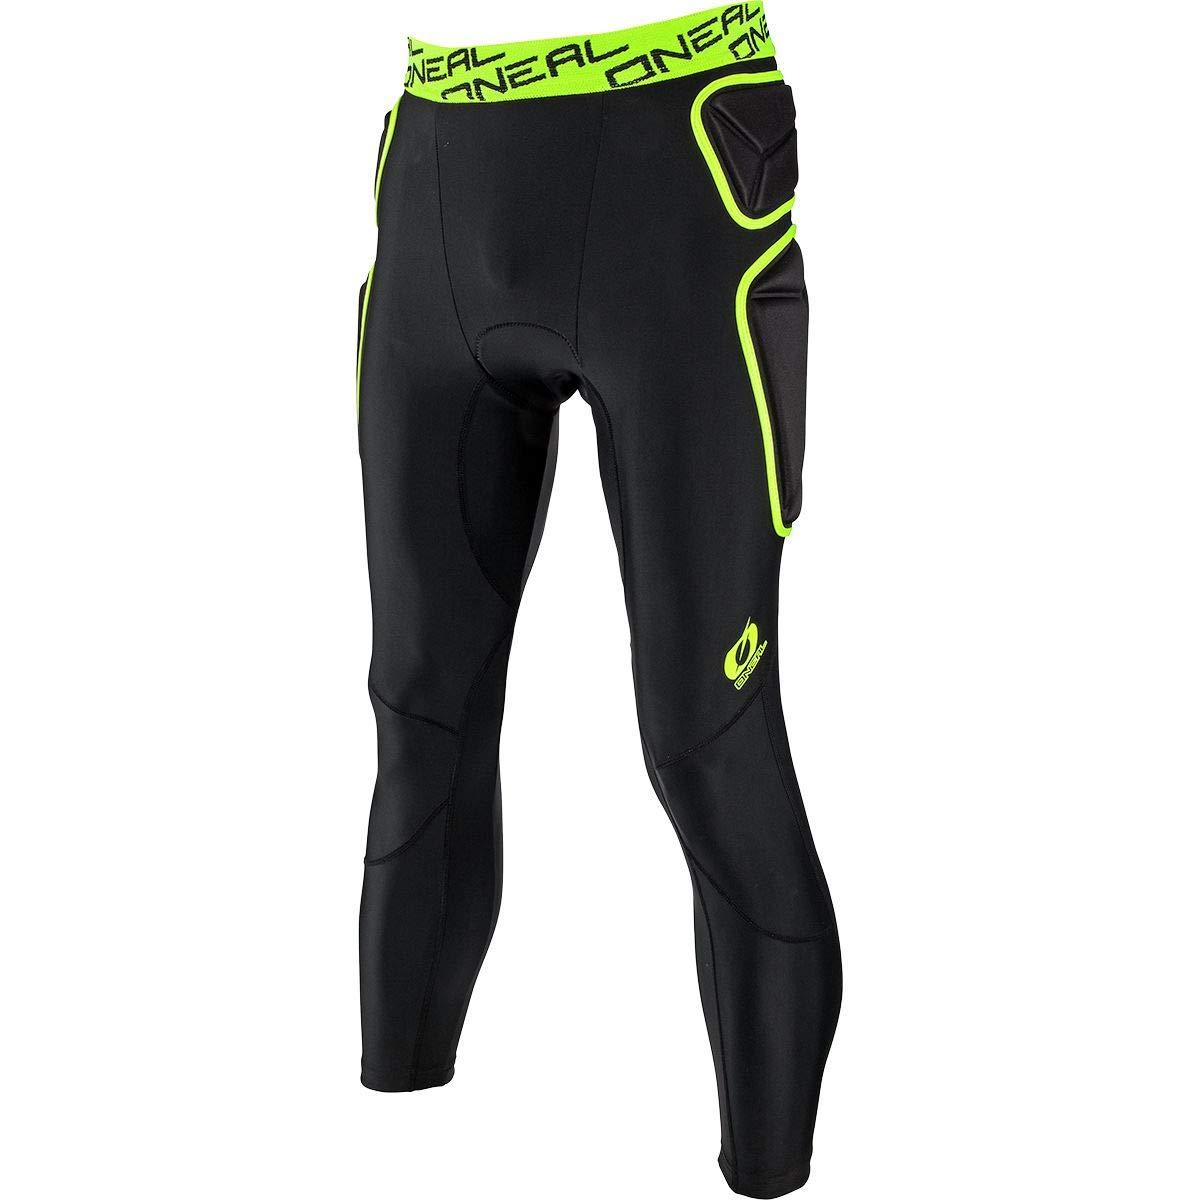 O'Neal Unisex-Adult Trail Pro Pant (Lime/Black, X-Large)